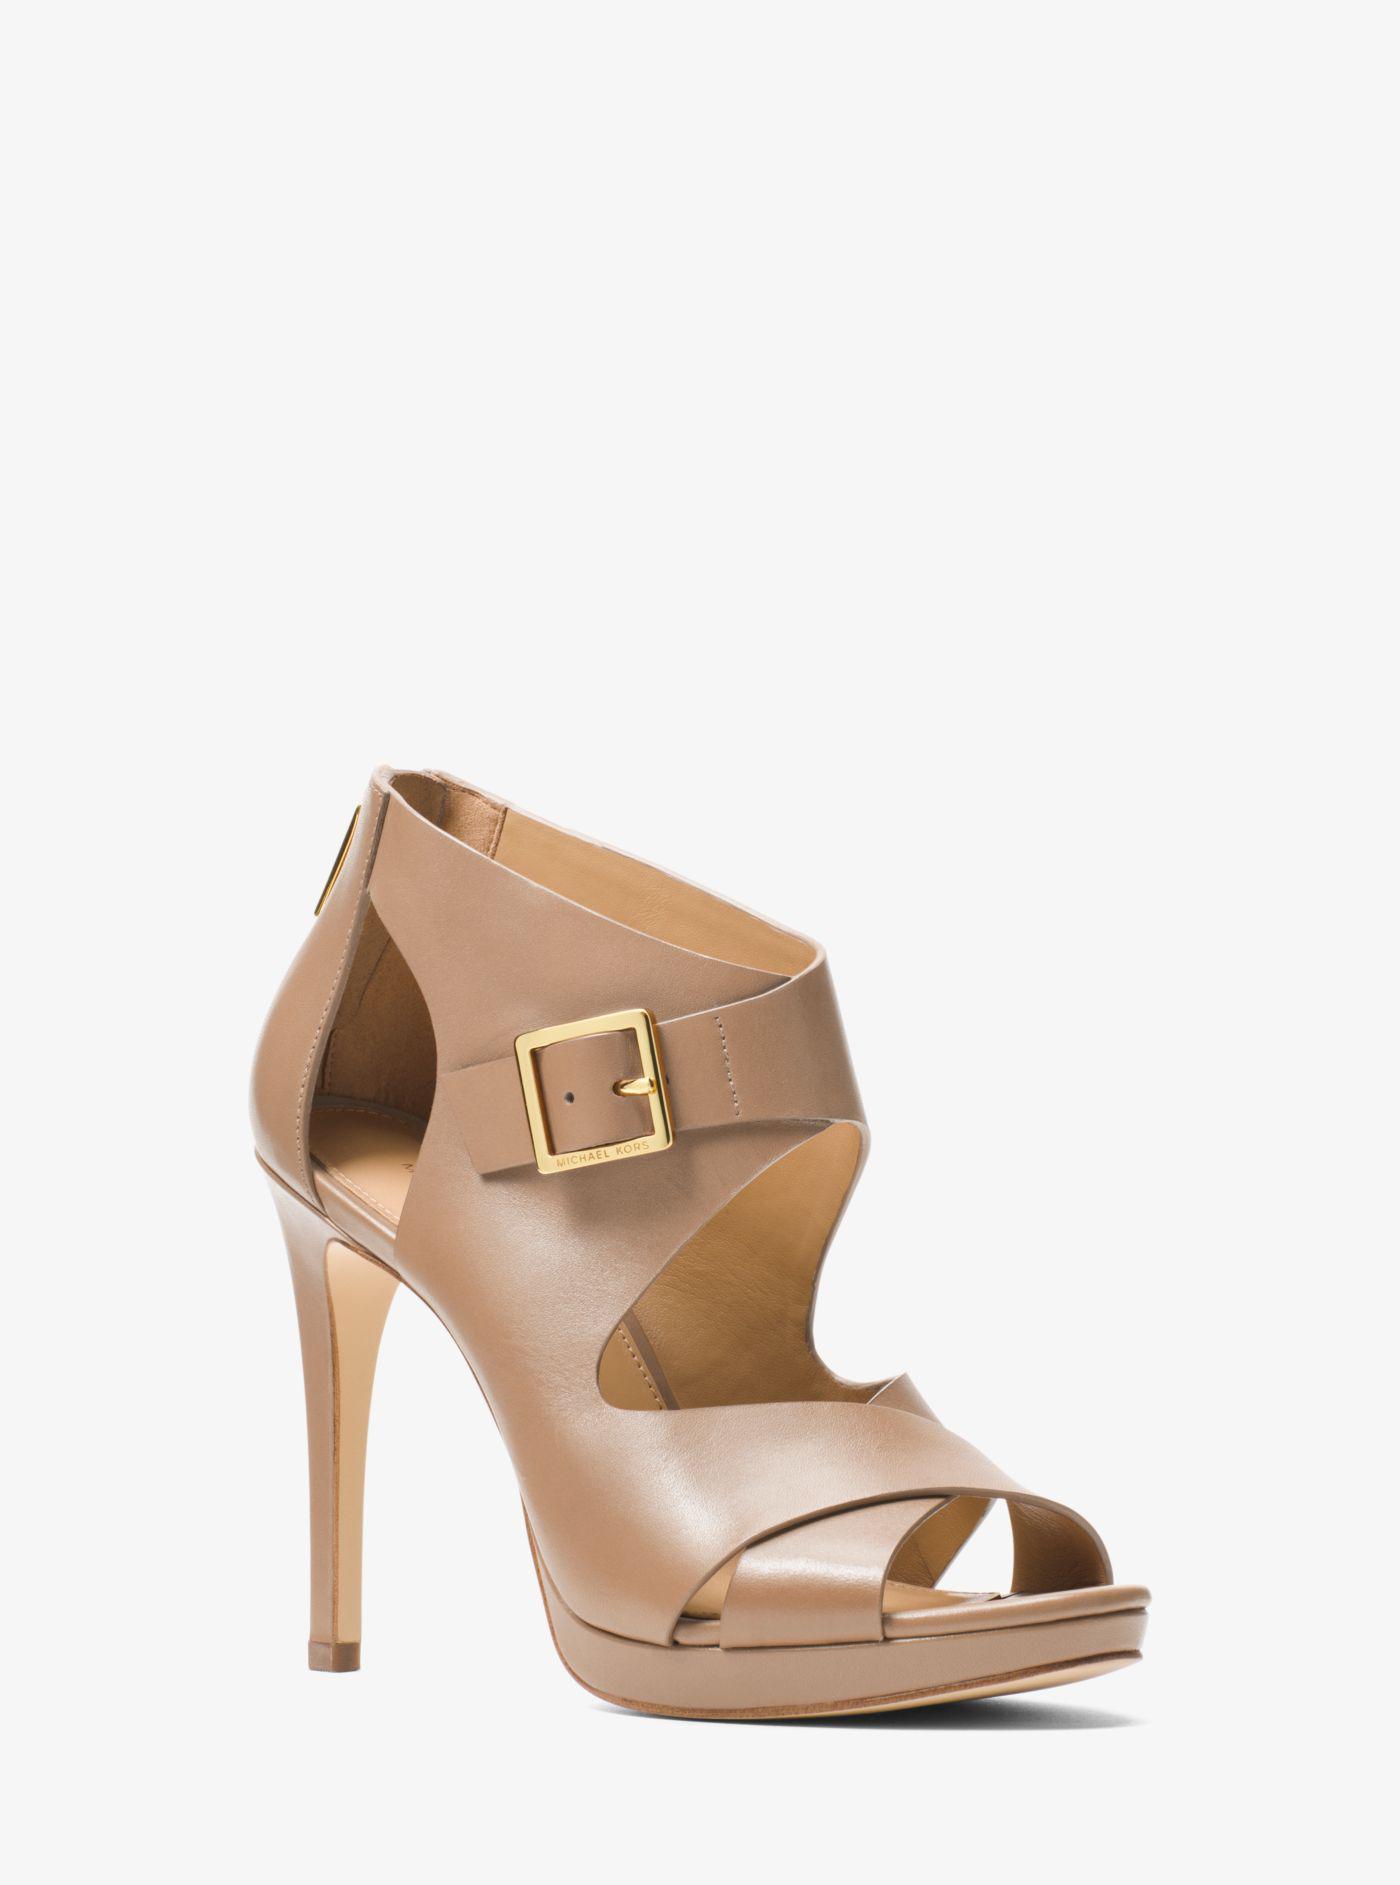 5c2f92fbf3d Michael Kors Kimber Leather Platform Sandal in Natural - Lyst